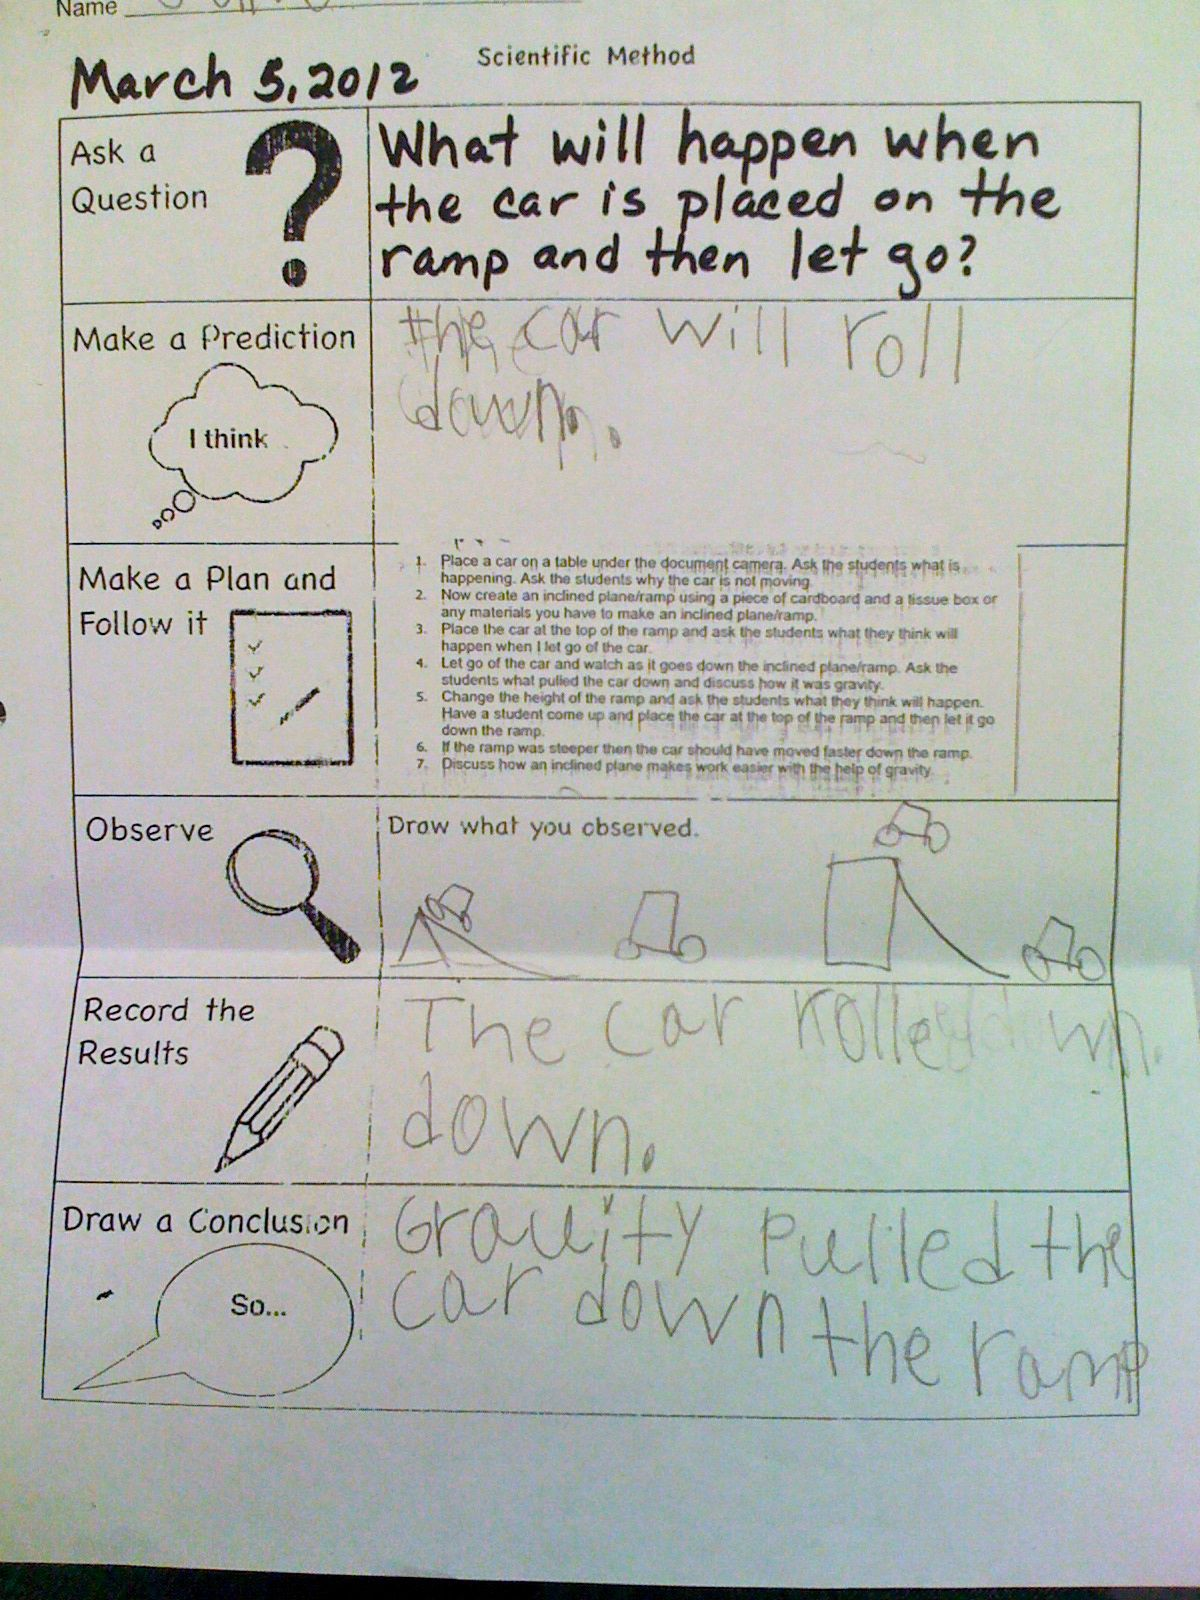 Musings Of An Organized Teacher Using The Scientific Method In Kindergarten Scientific Method Science Lessons Teaching Science [ 1600 x 1200 Pixel ]